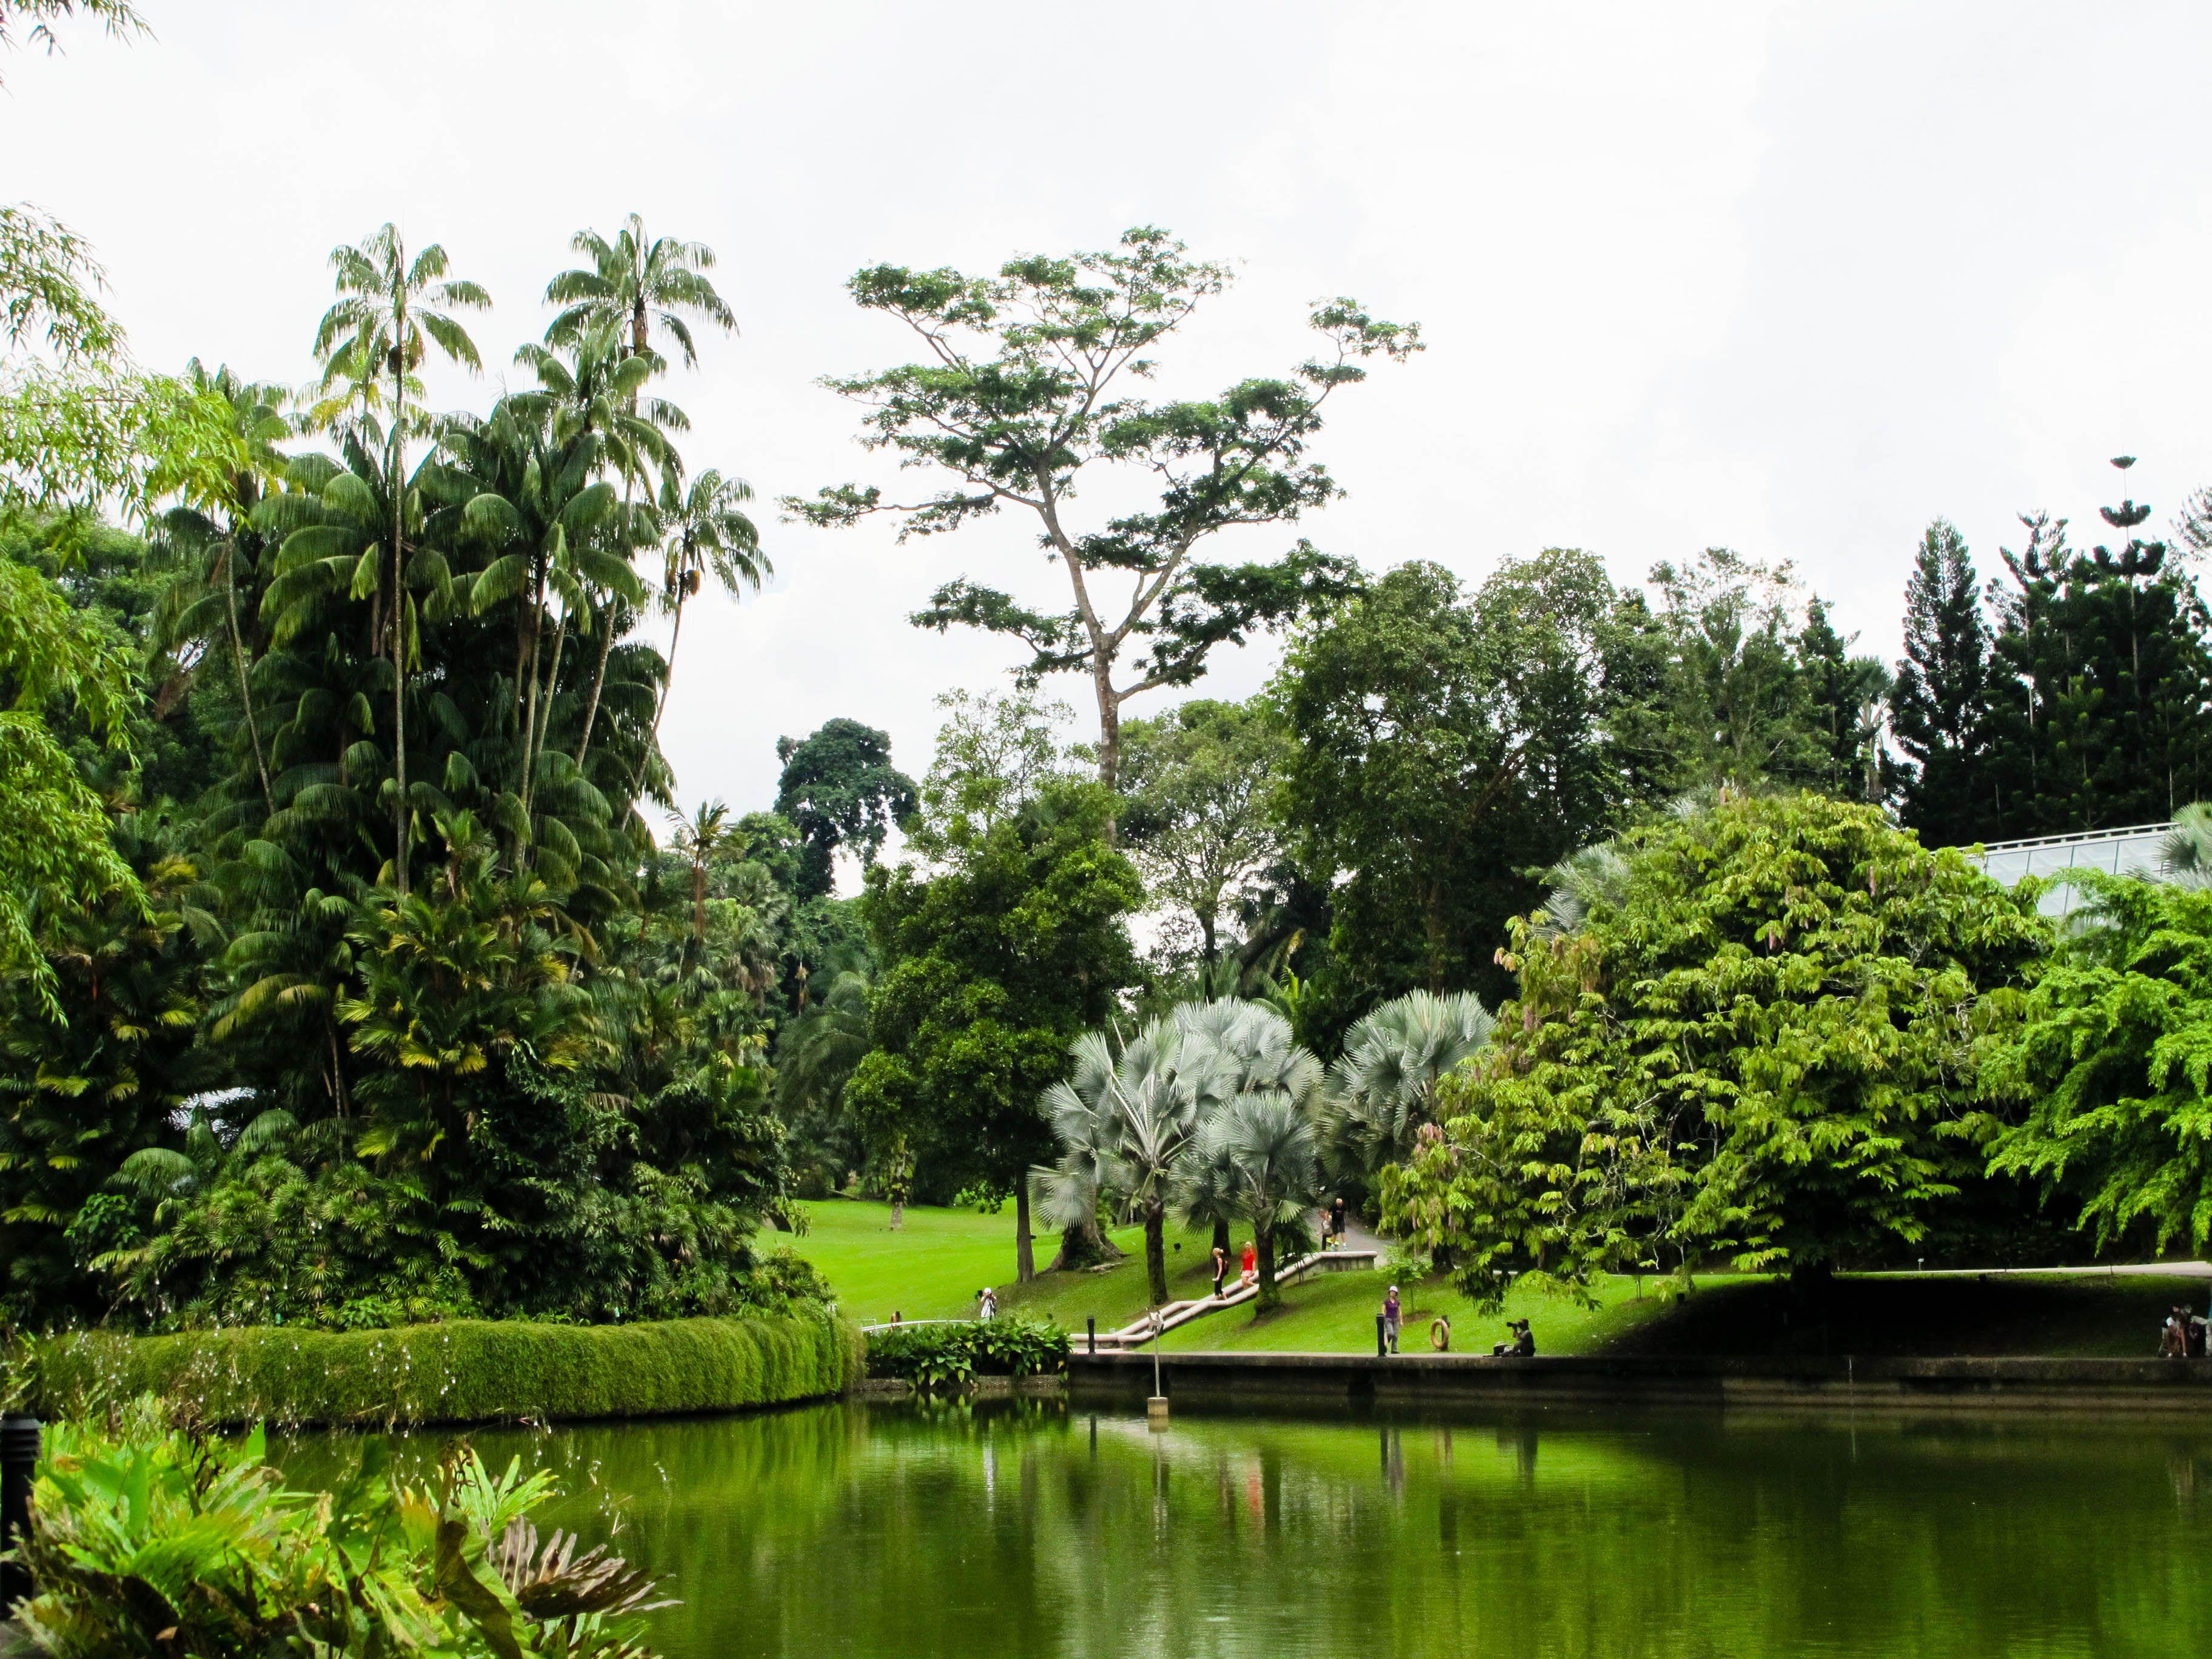 Singapore Botanic Gardens Lake Singapore Botanic Gardens